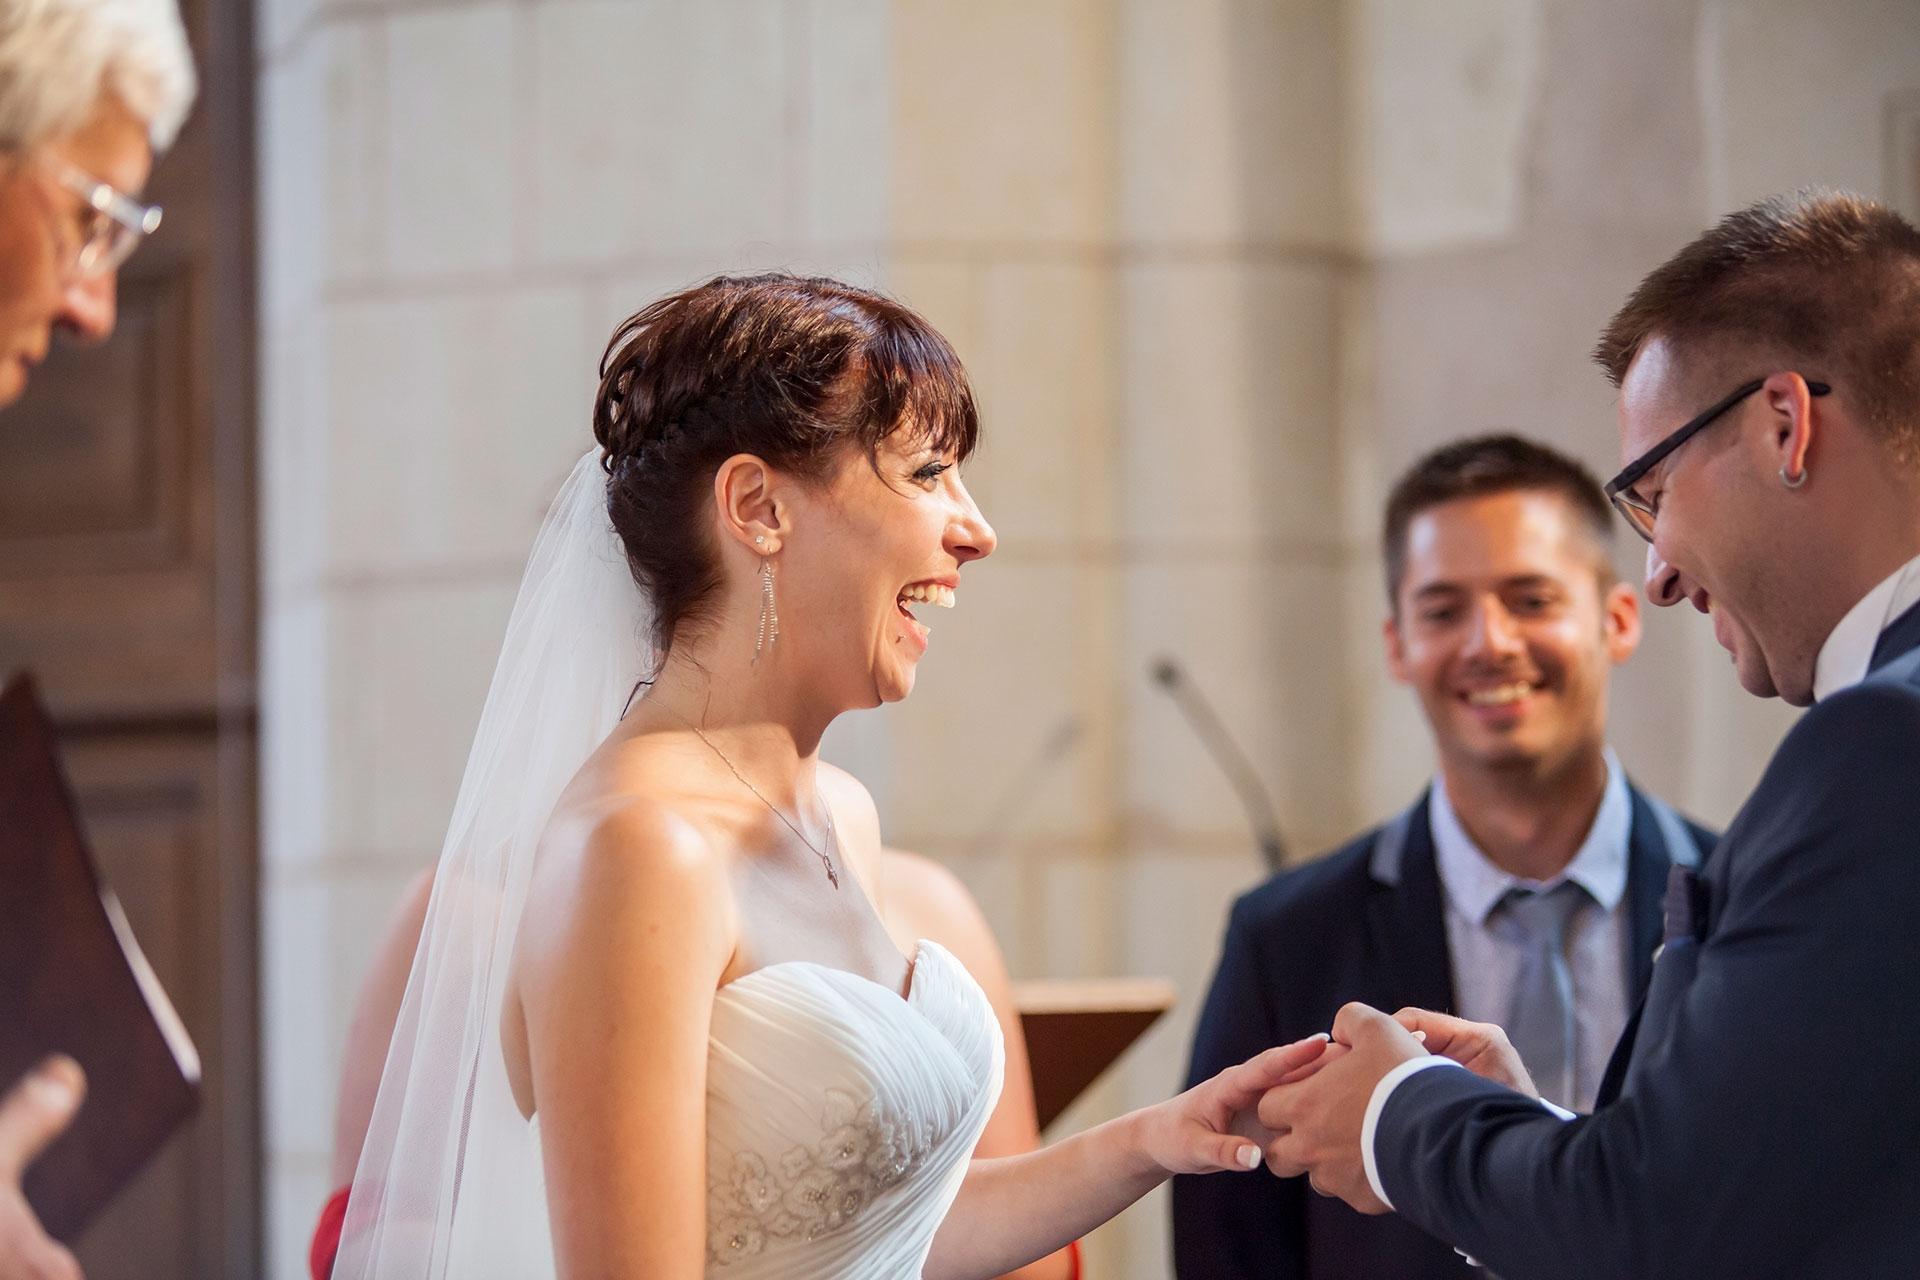 particuliers-evenements-mariages-oui-aurelie&geoffrey-20